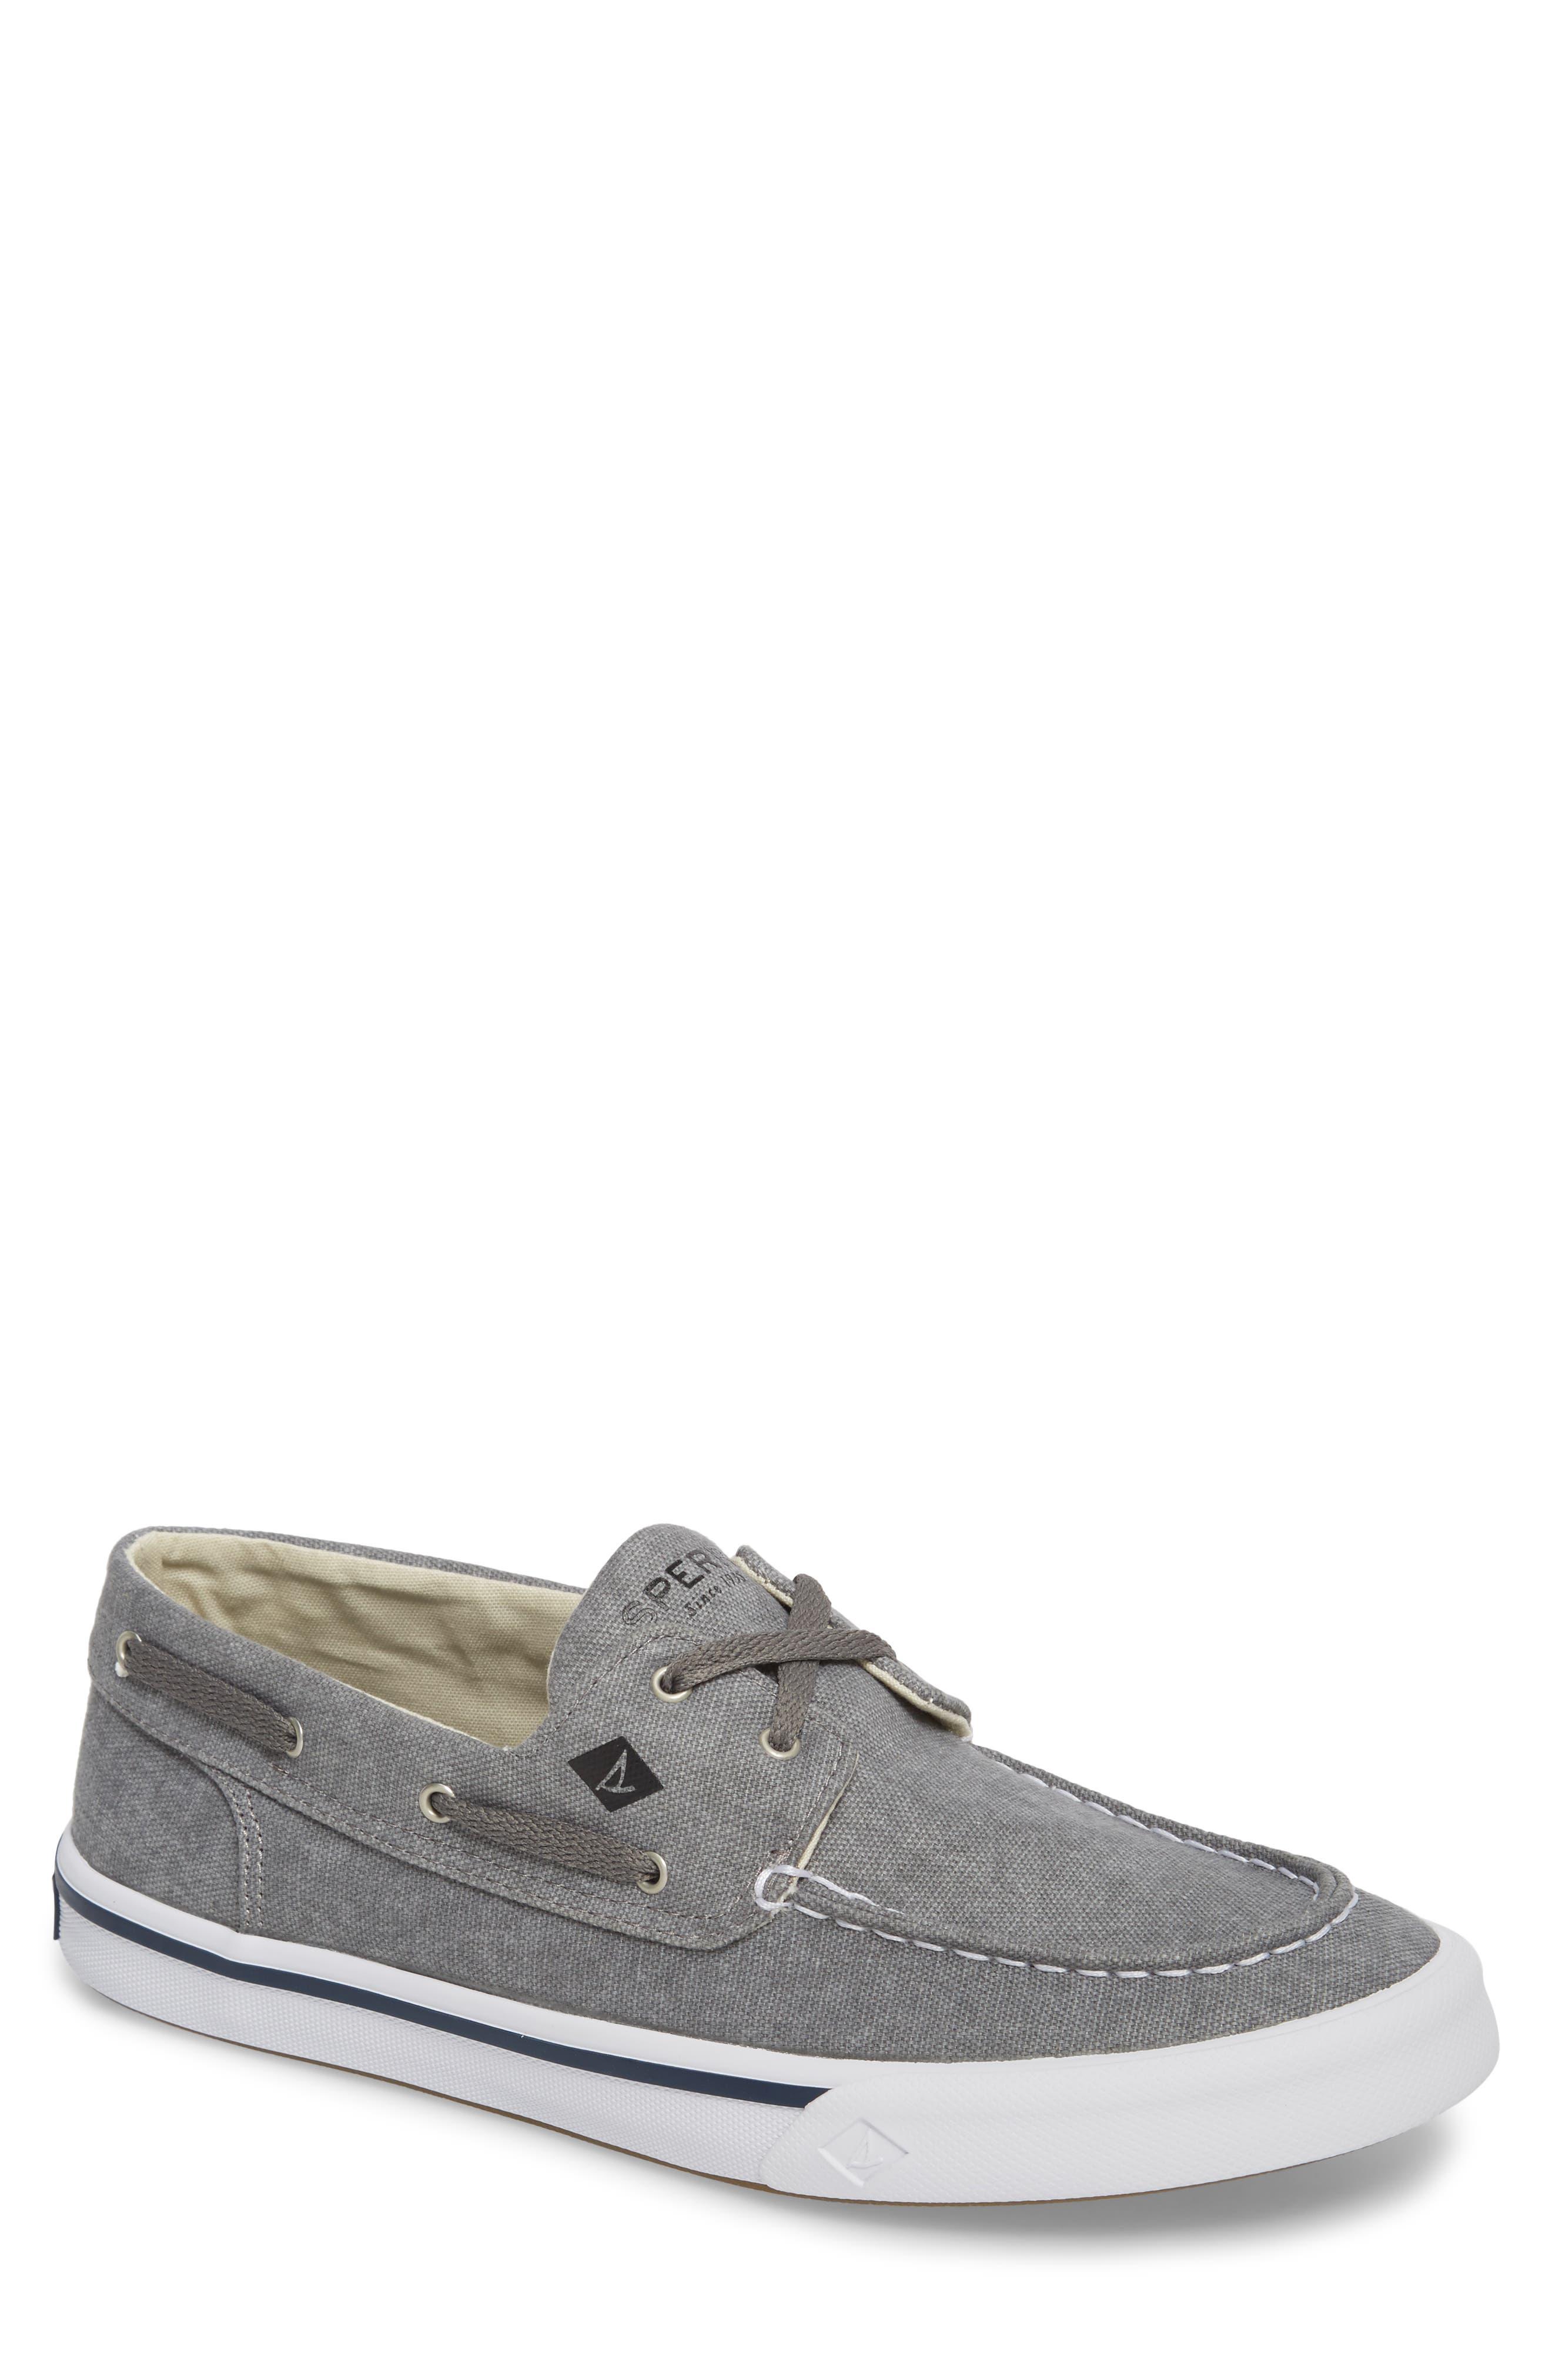 Striper 2 Boat Shoe,                             Main thumbnail 1, color,                             GREY CANVAS